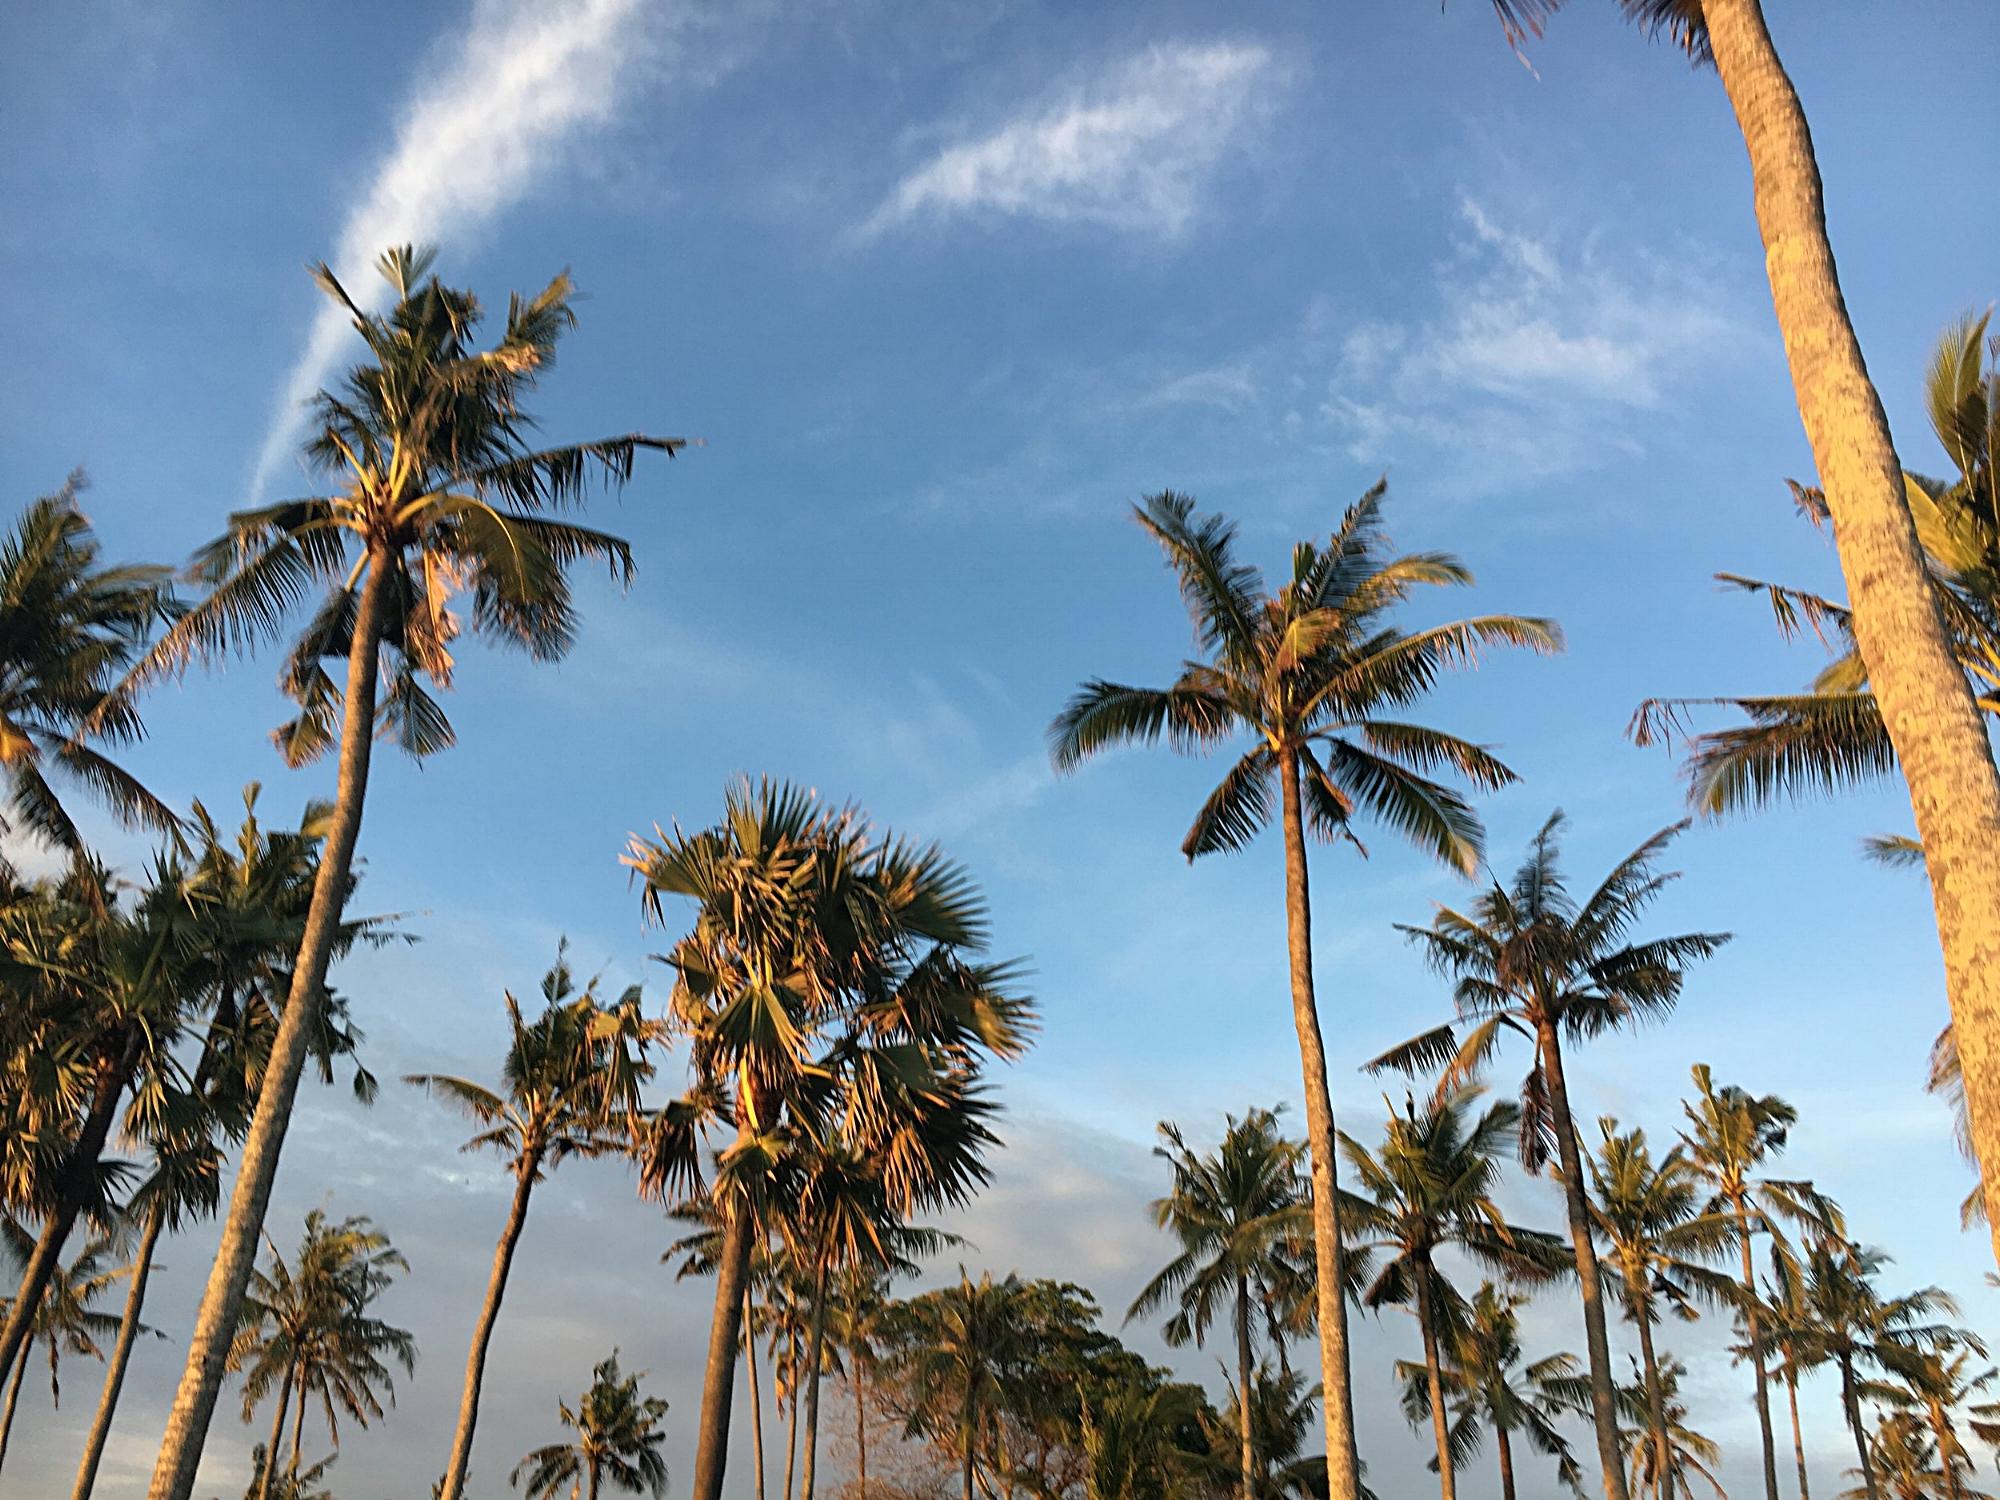 Palm trees at Finn's beach club in Canggu, Bali! 14 fun things to do on your trip to Bali!